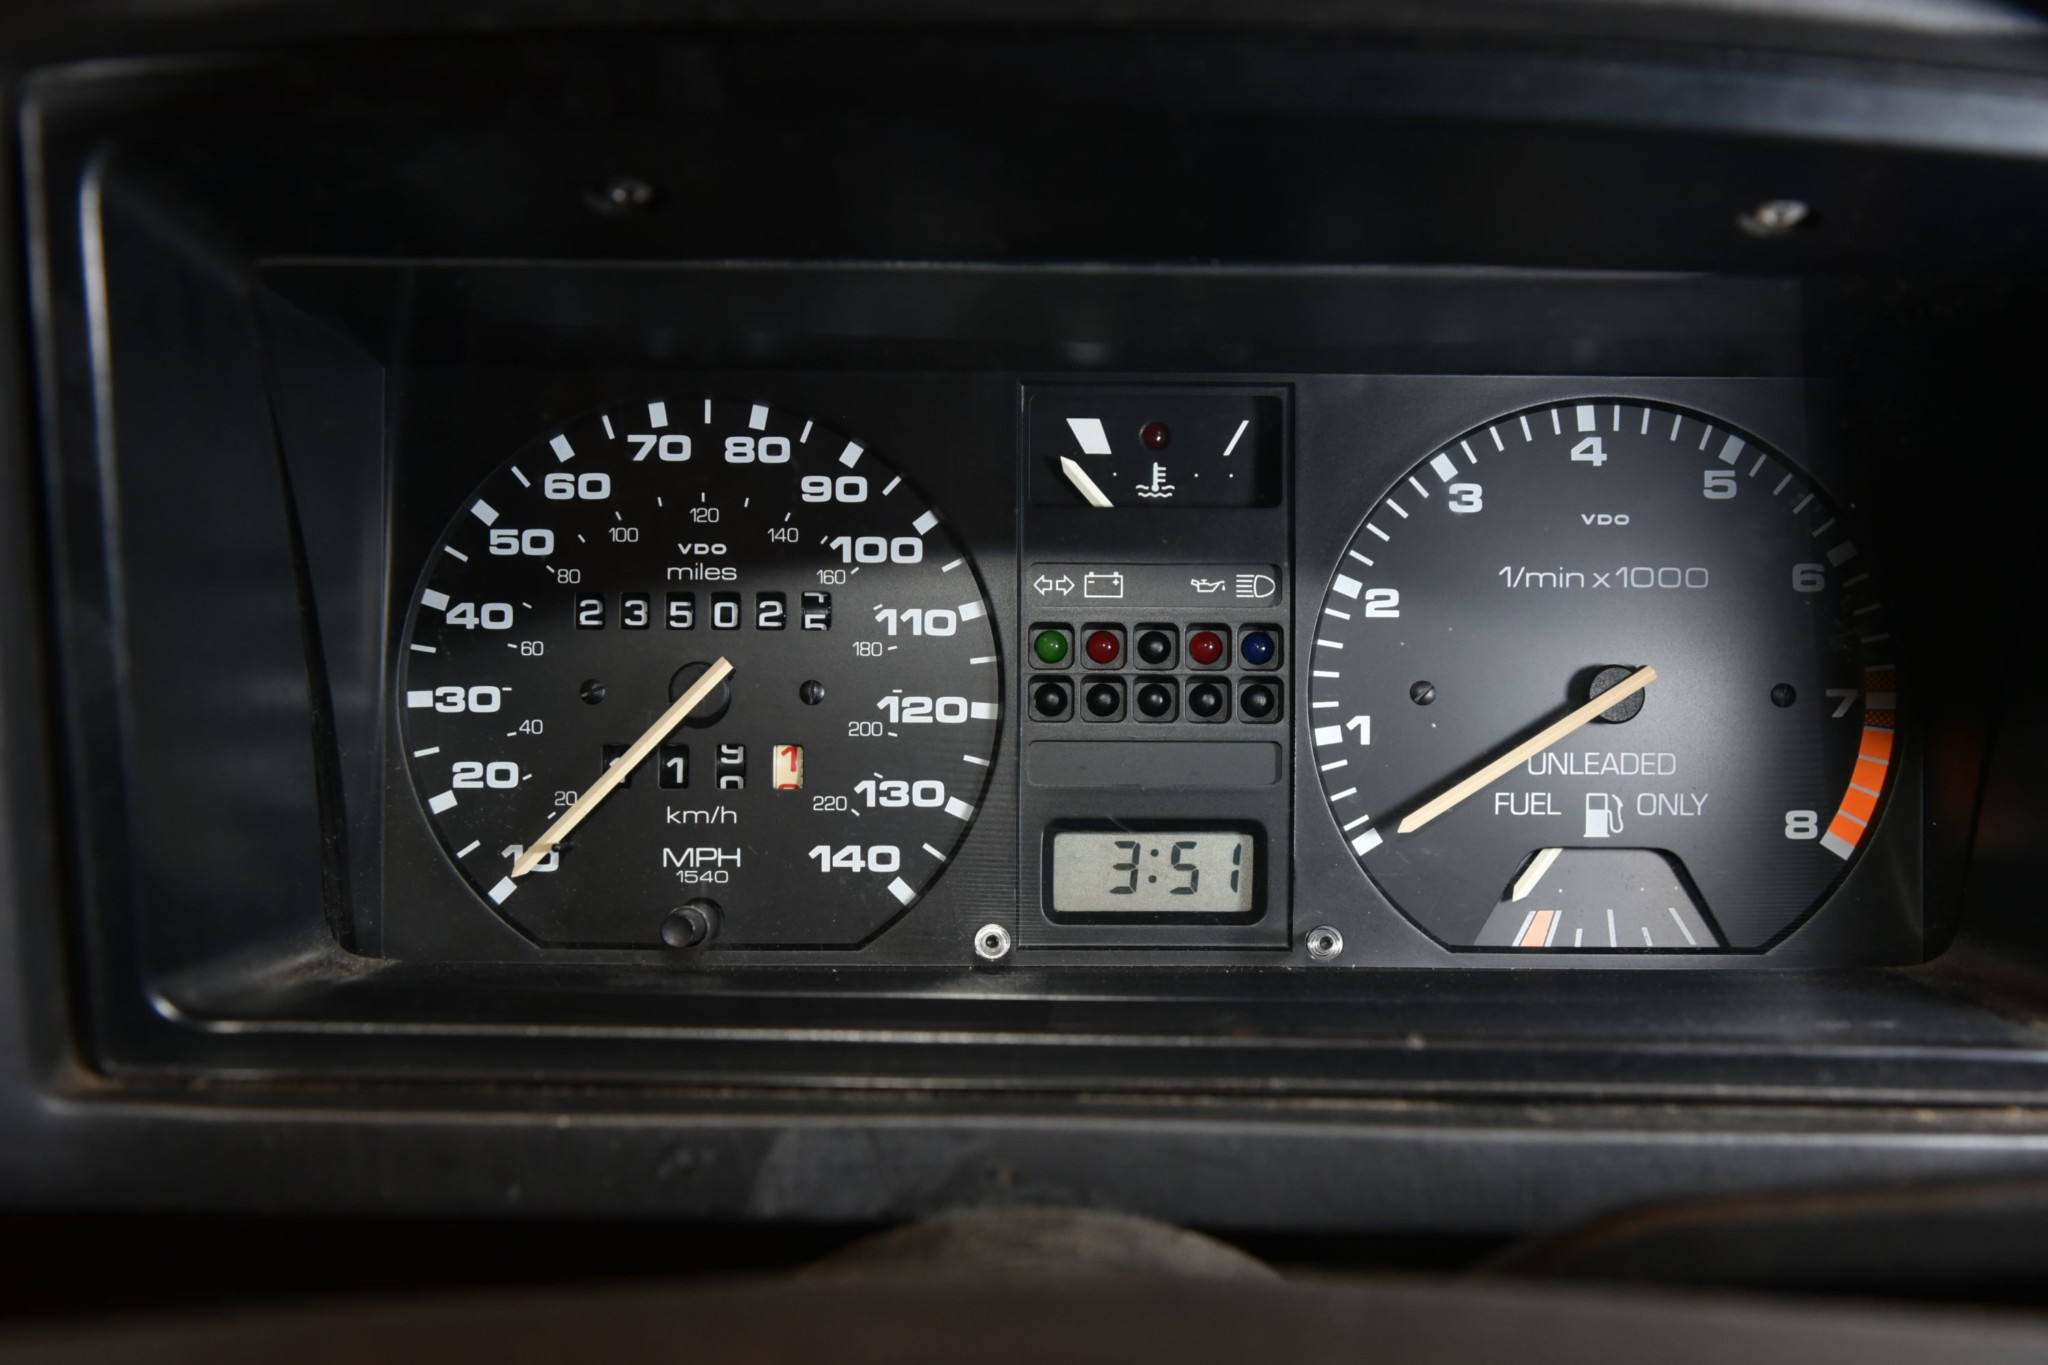 1988_volkswagen_scirocco_16v_1579623062f9f98764daDSC_6248